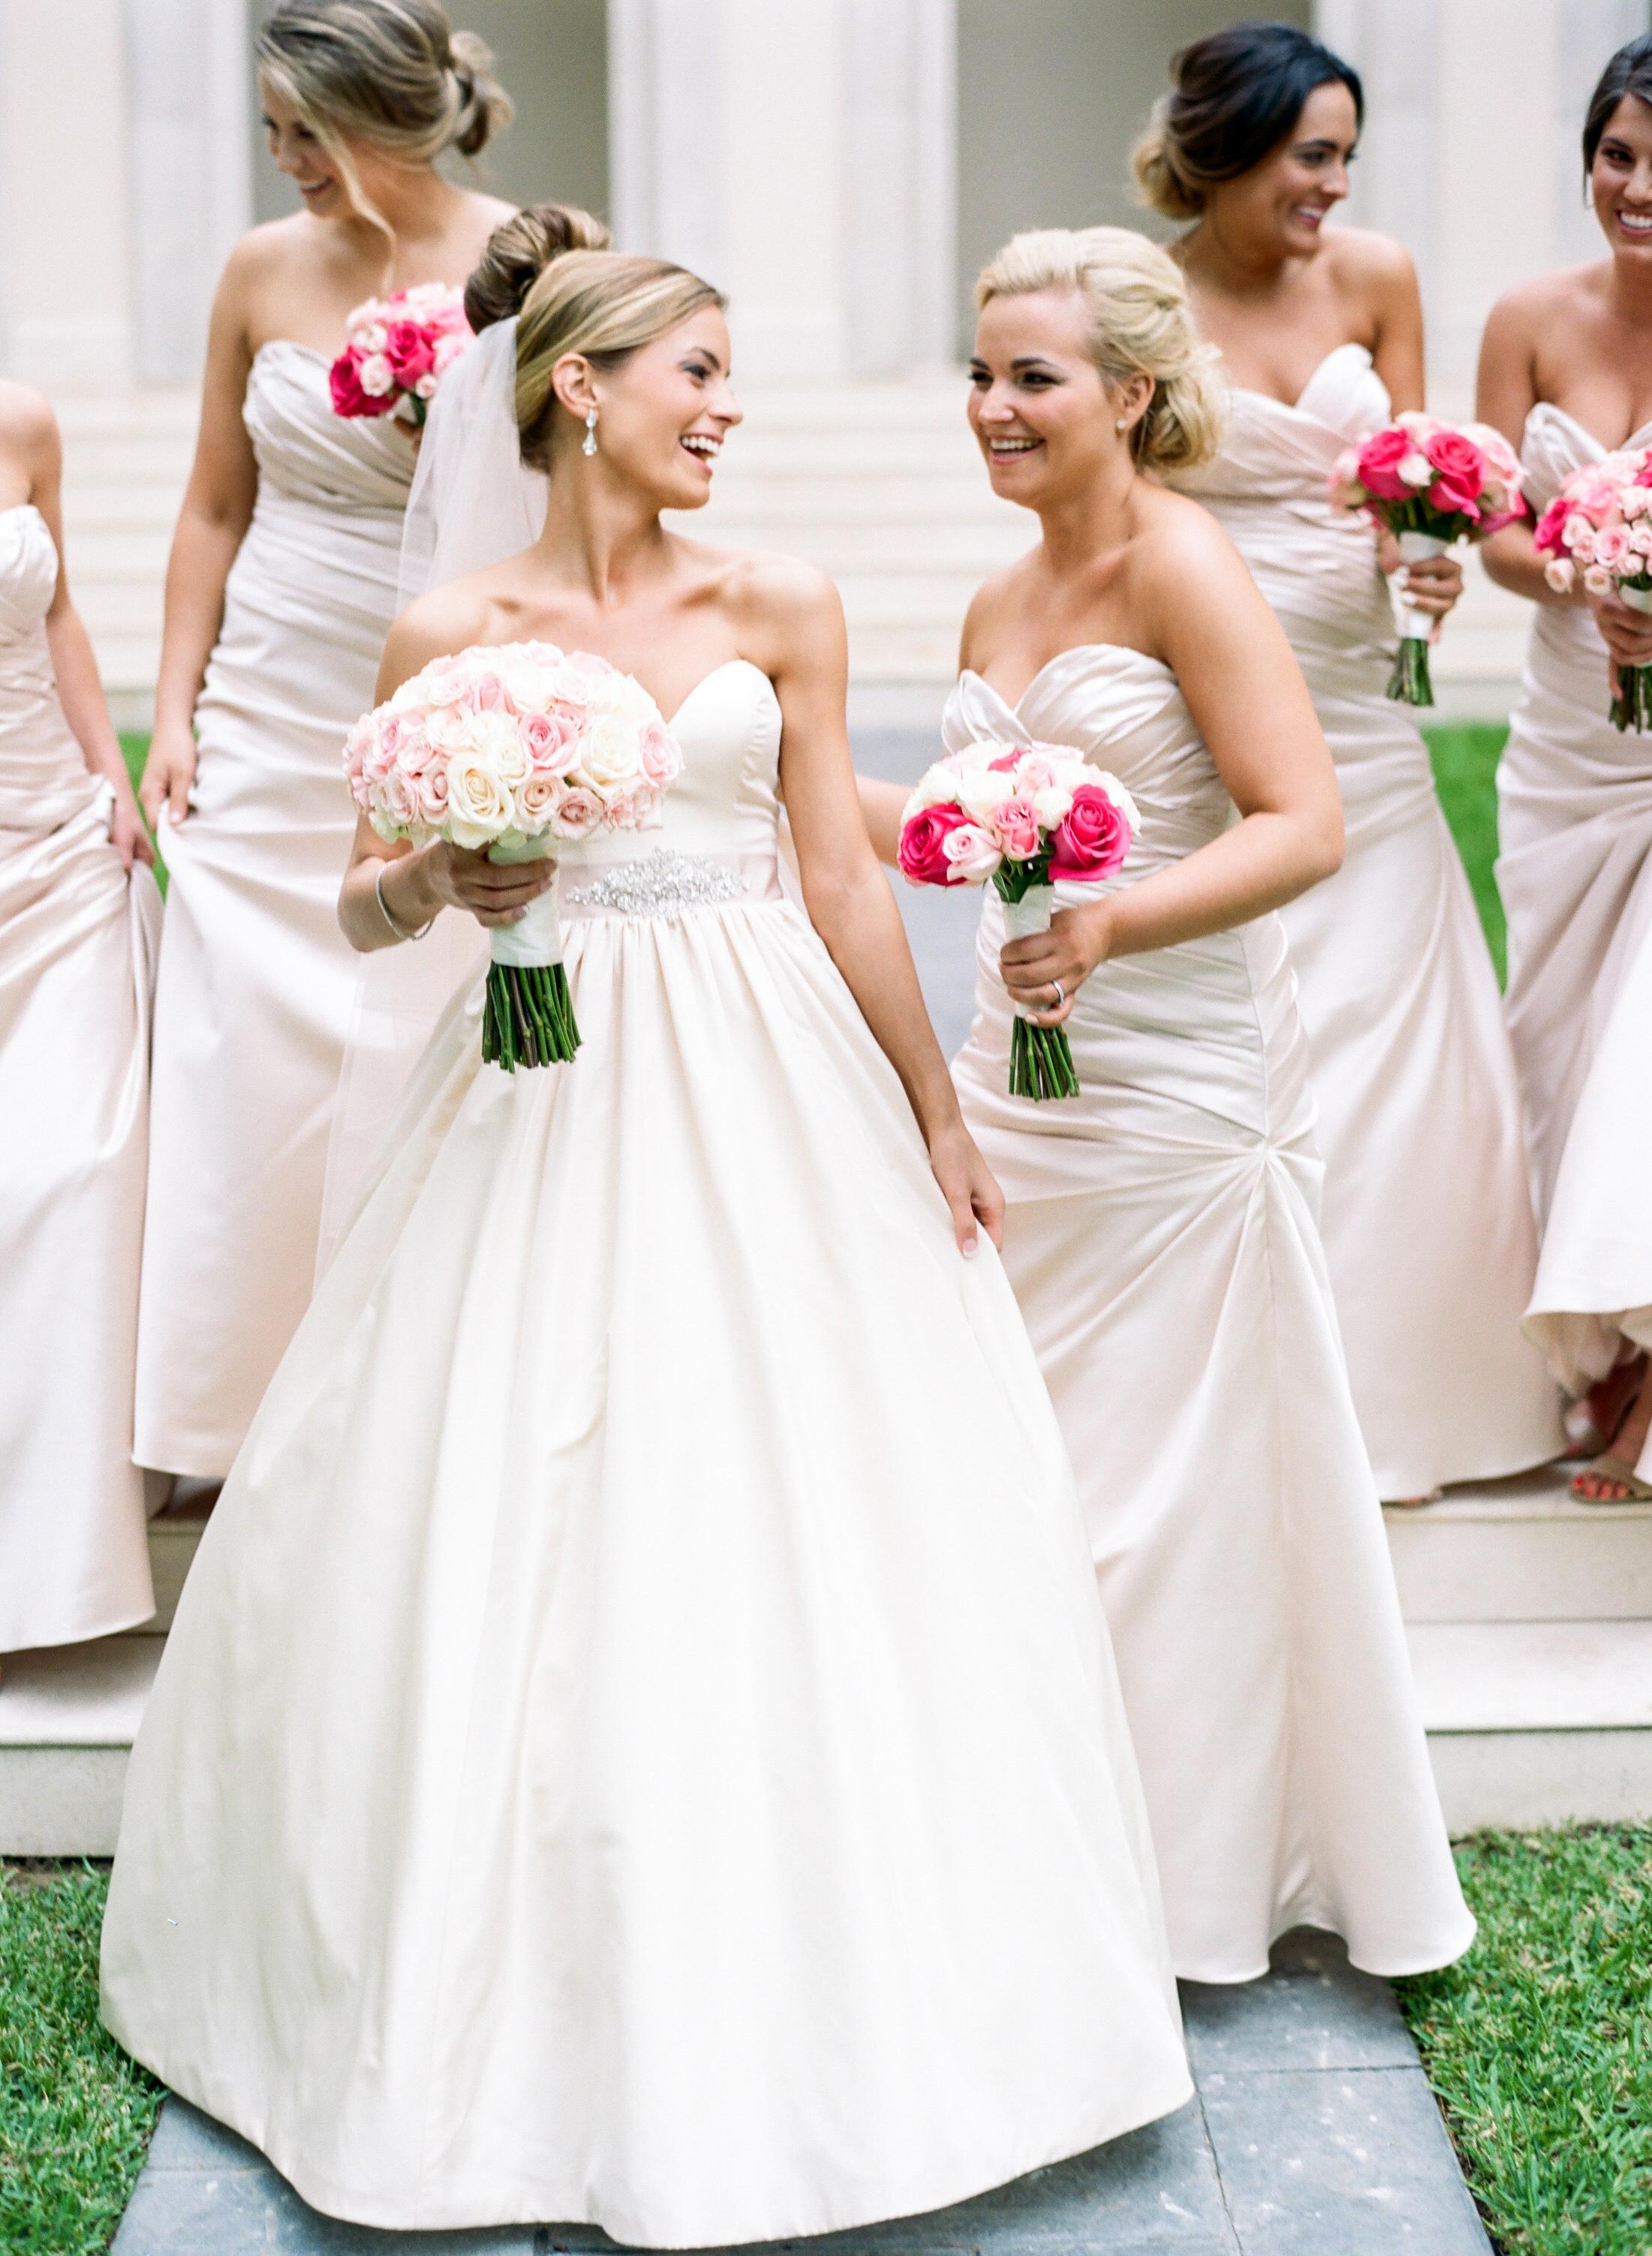 Dana-Fernandez-Photography-Houston-Wedding-Photographer-Style-Me-Pretty-Film-Texas-Destination-Photographer-25.jpg